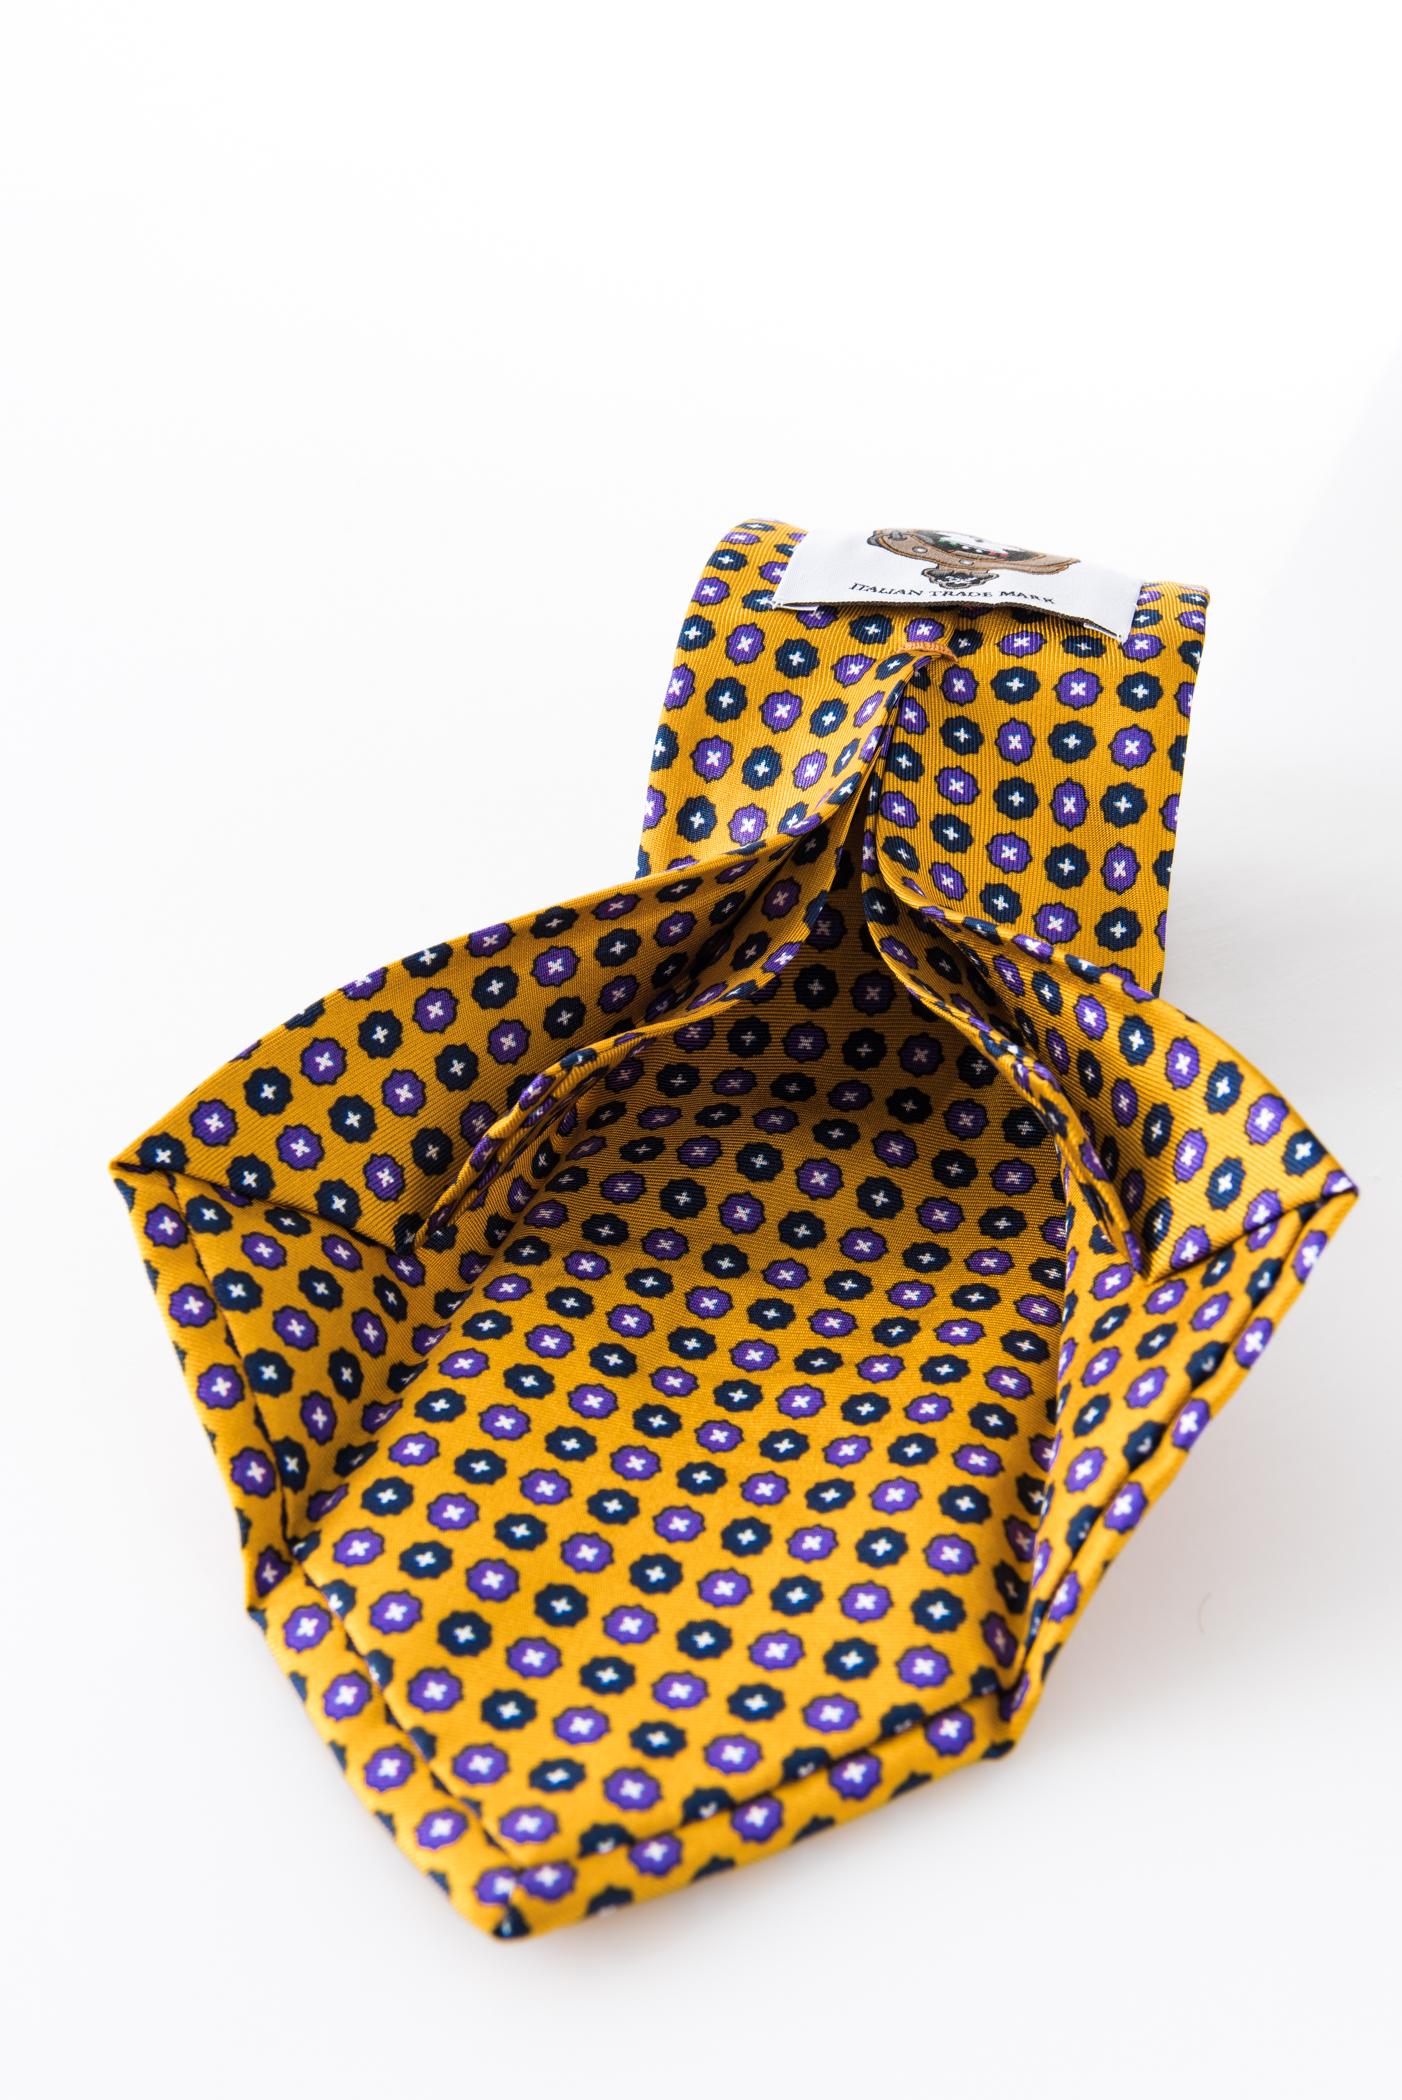 Seven-fold Tie – Aniceta Giallo Senape – seven-fold detail